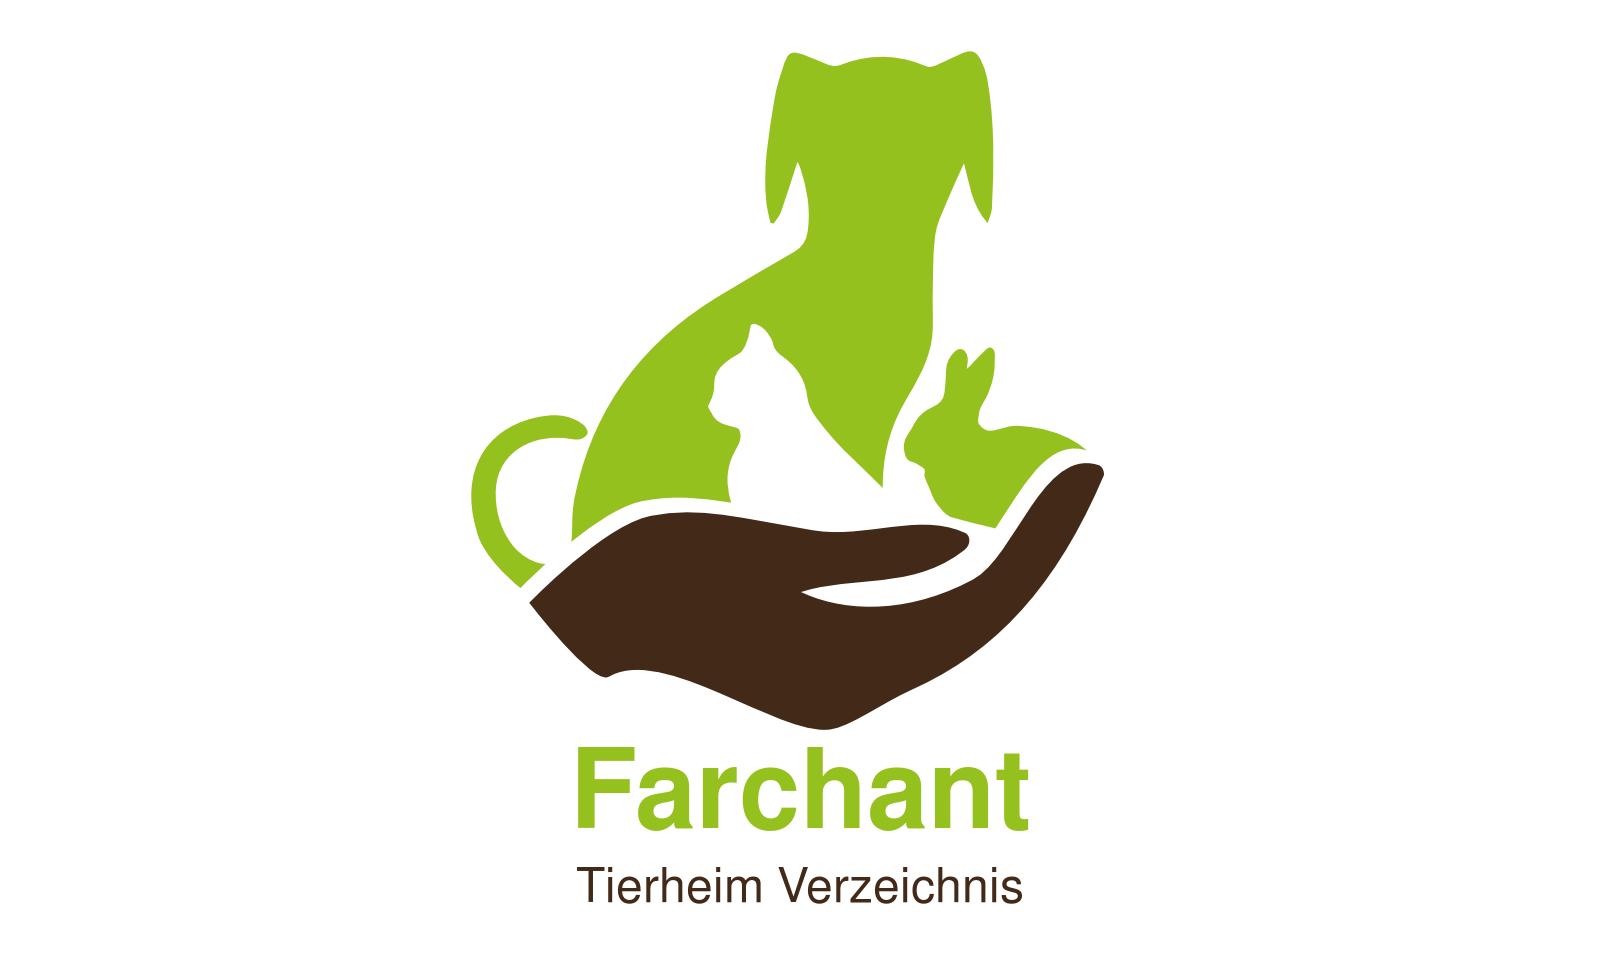 Tierheim Farchant